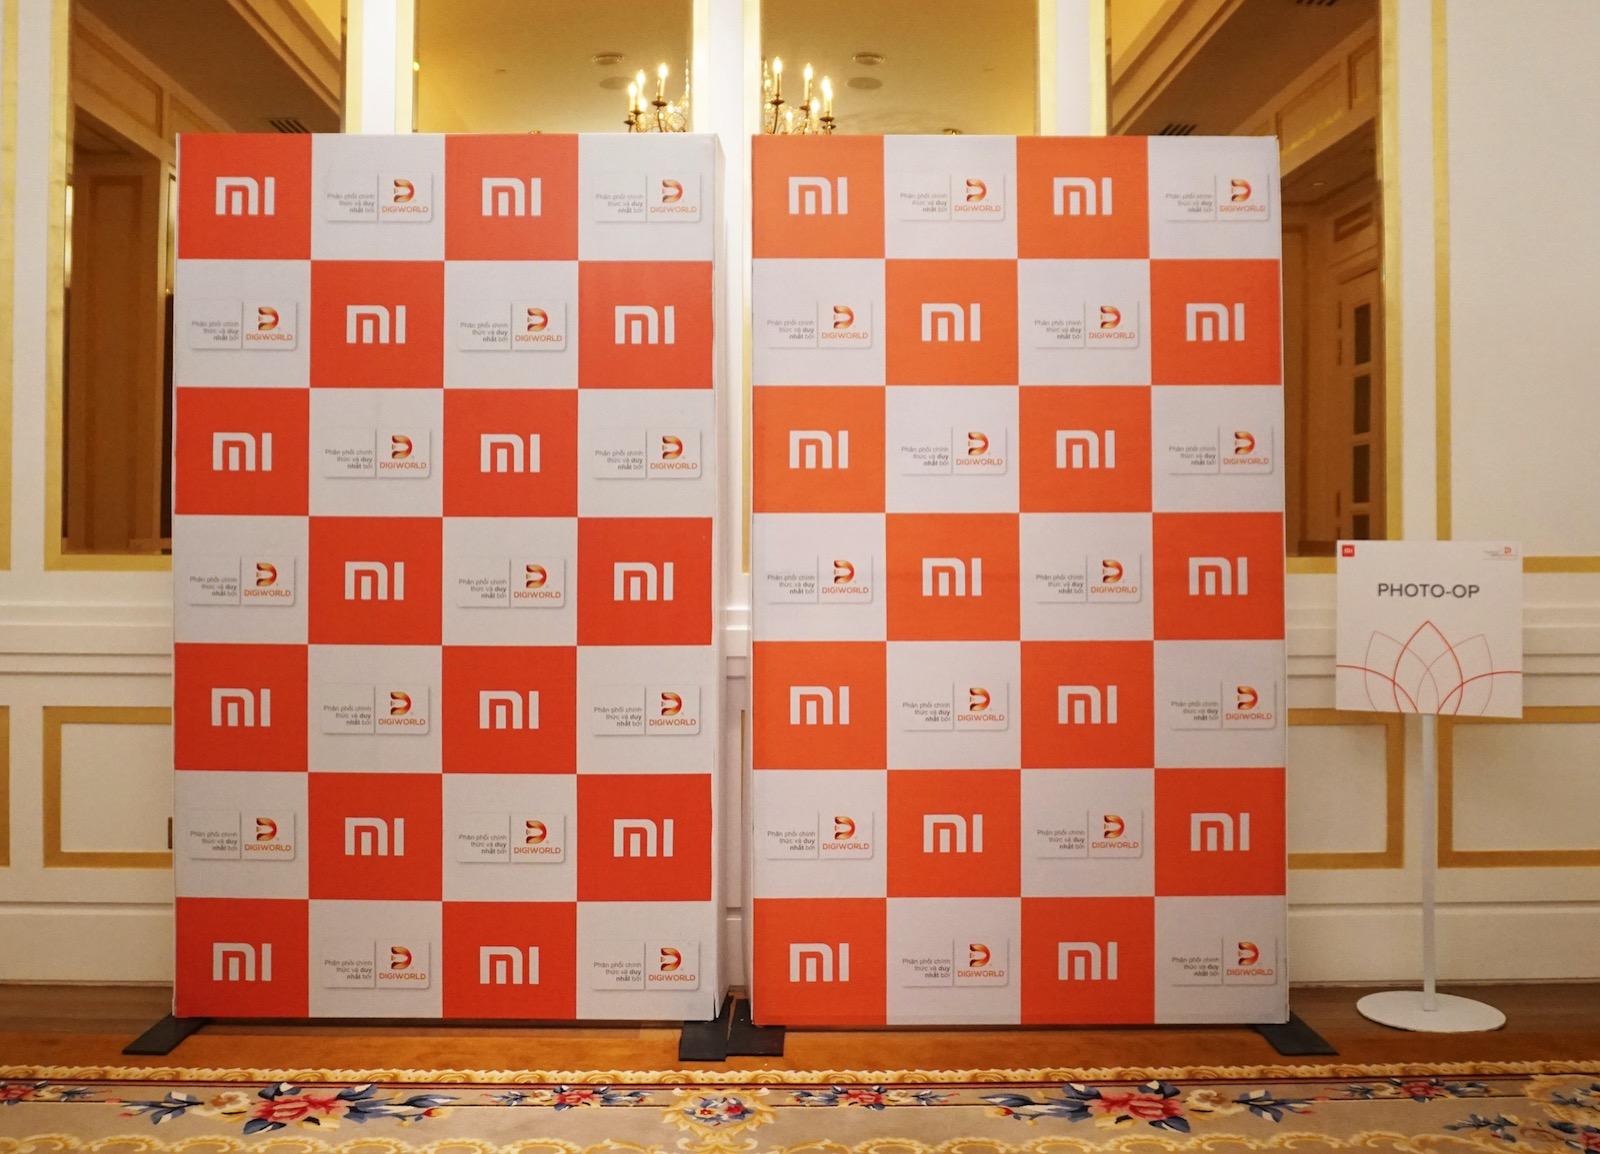 Xiaomi-Logos-Photo-stand.JPG